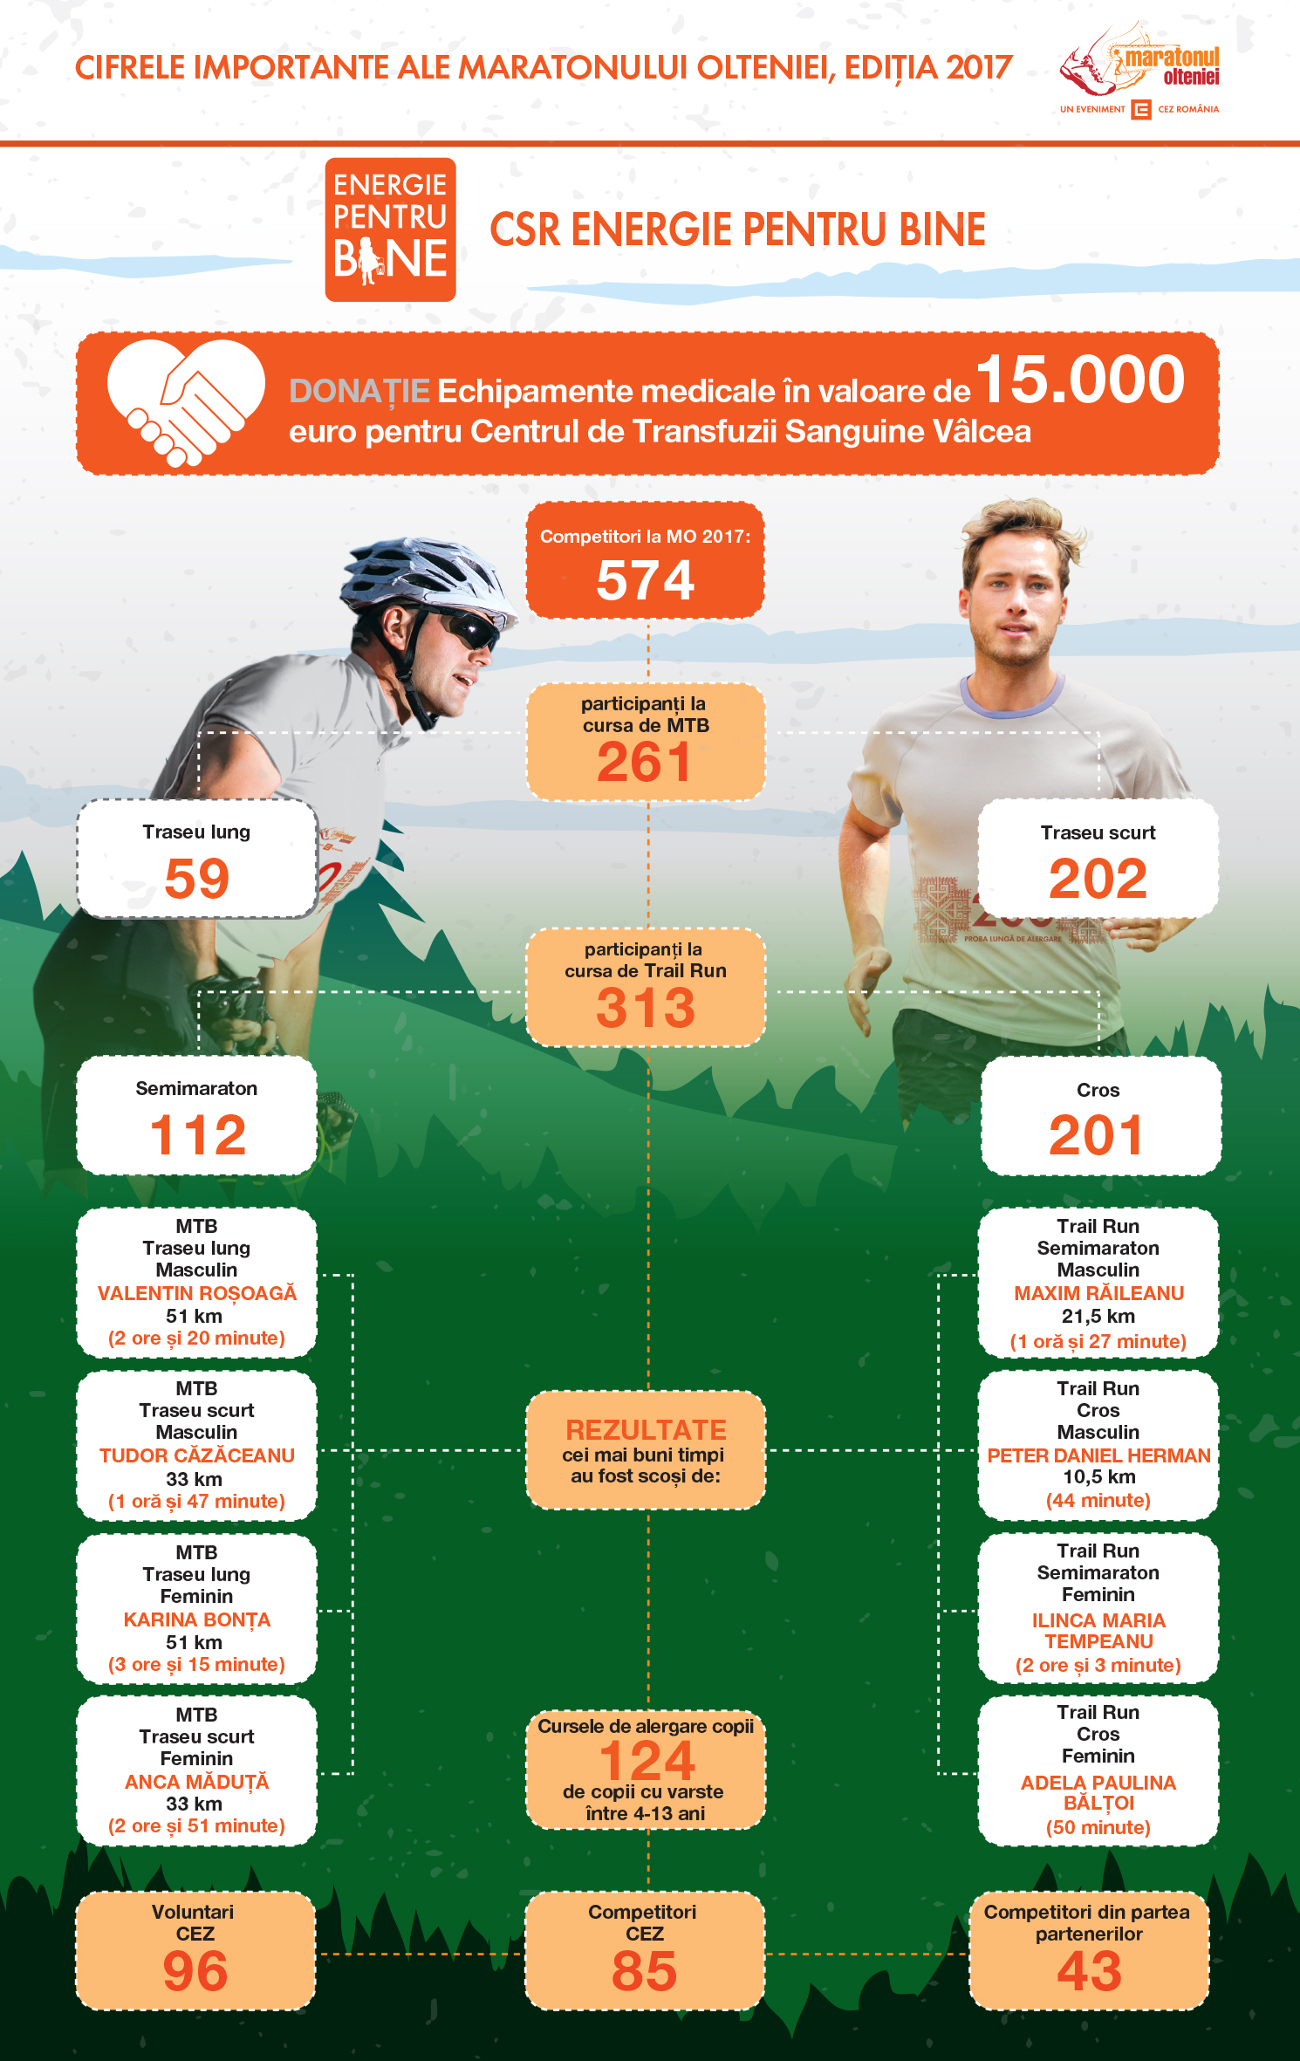 Maratonul Olteniei Infographic